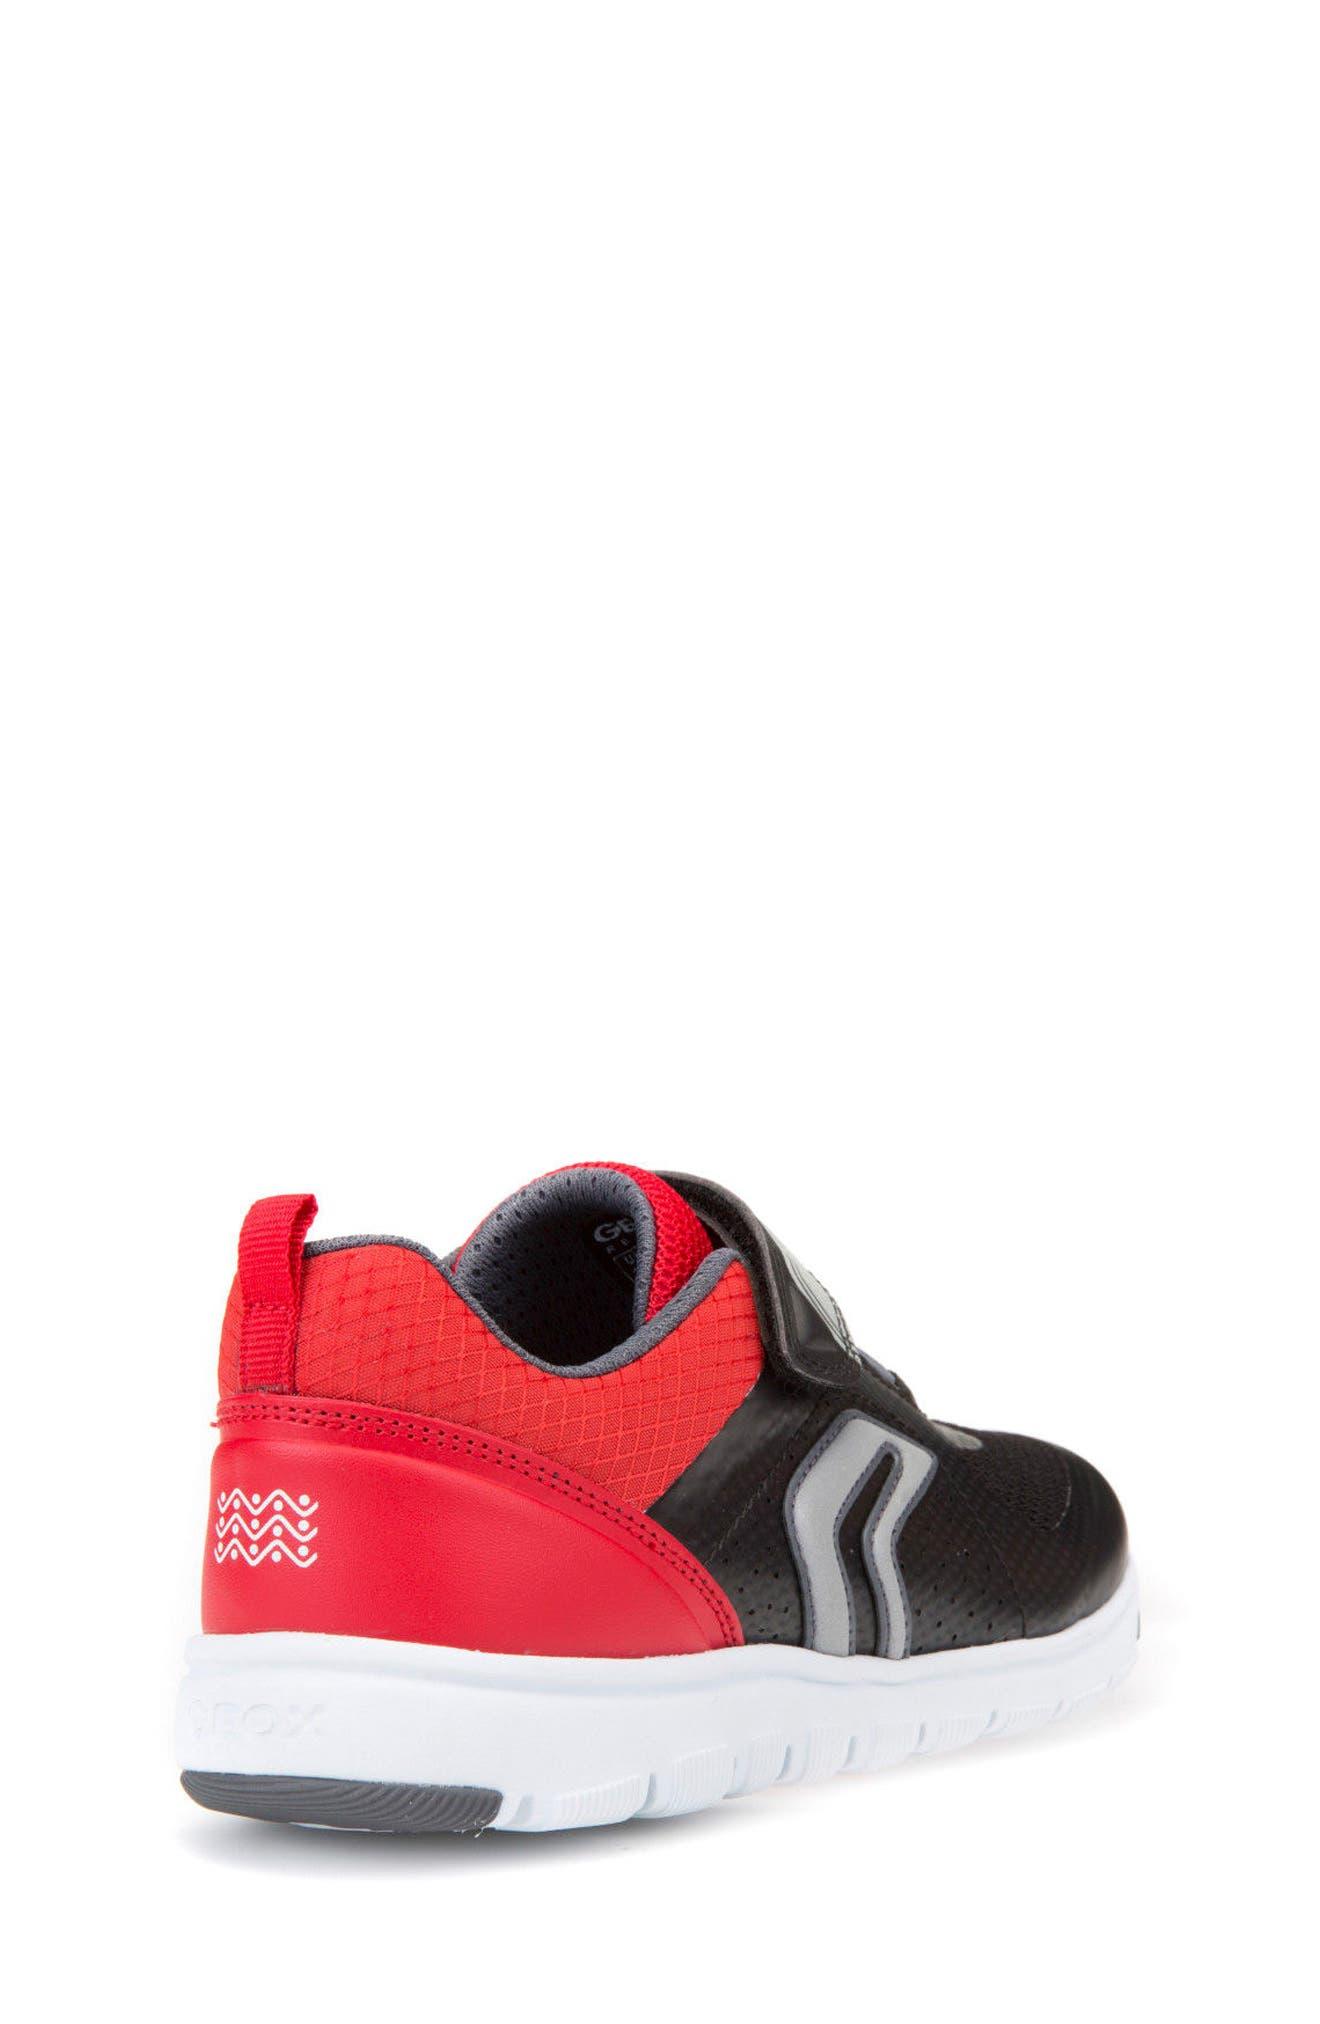 Xunday Low Top Sneaker,                             Alternate thumbnail 2, color,                             001